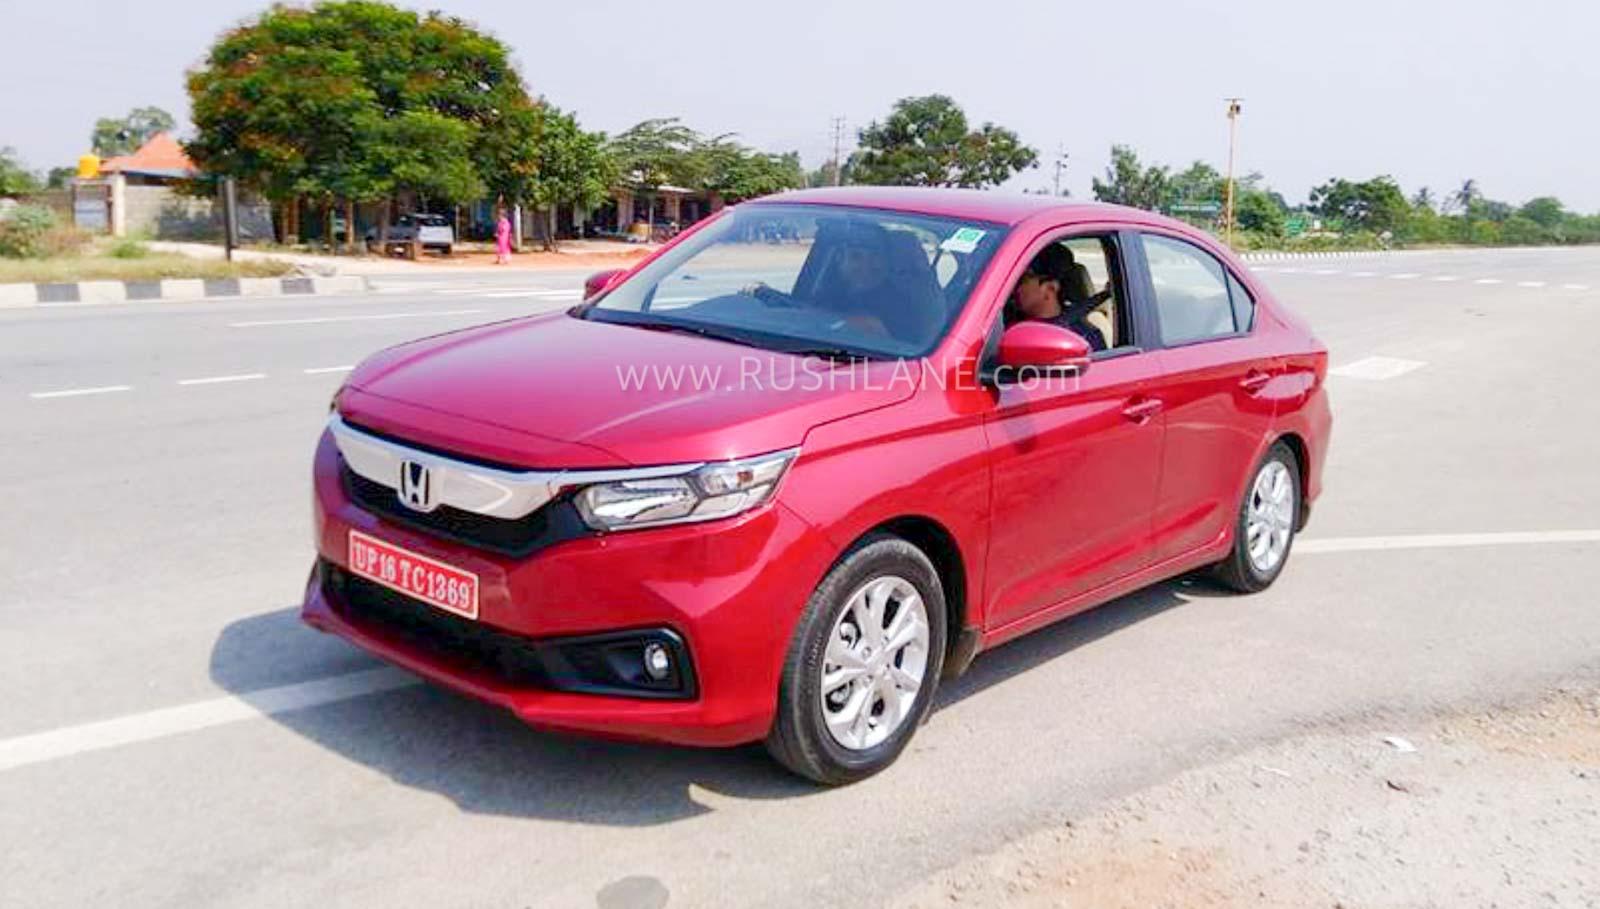 Honda Amaze sales India